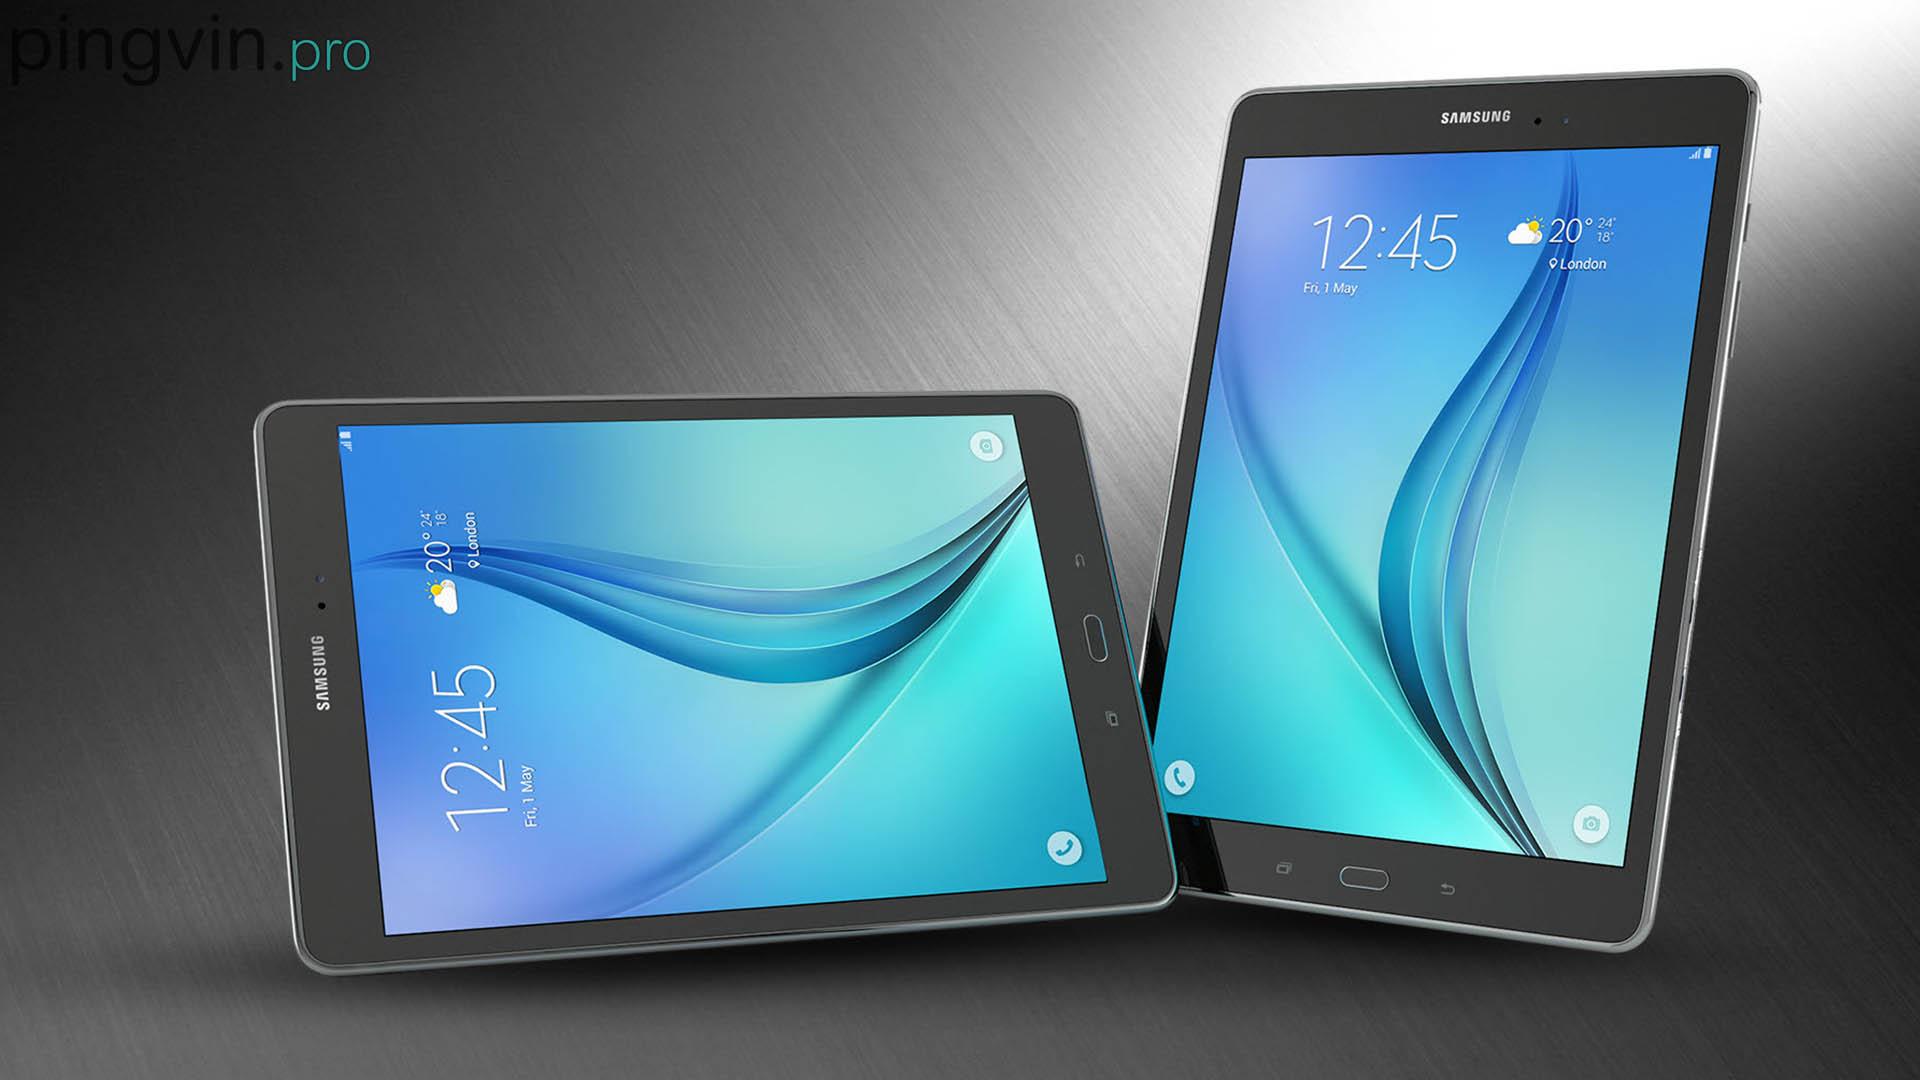 samsung tablet - Staples